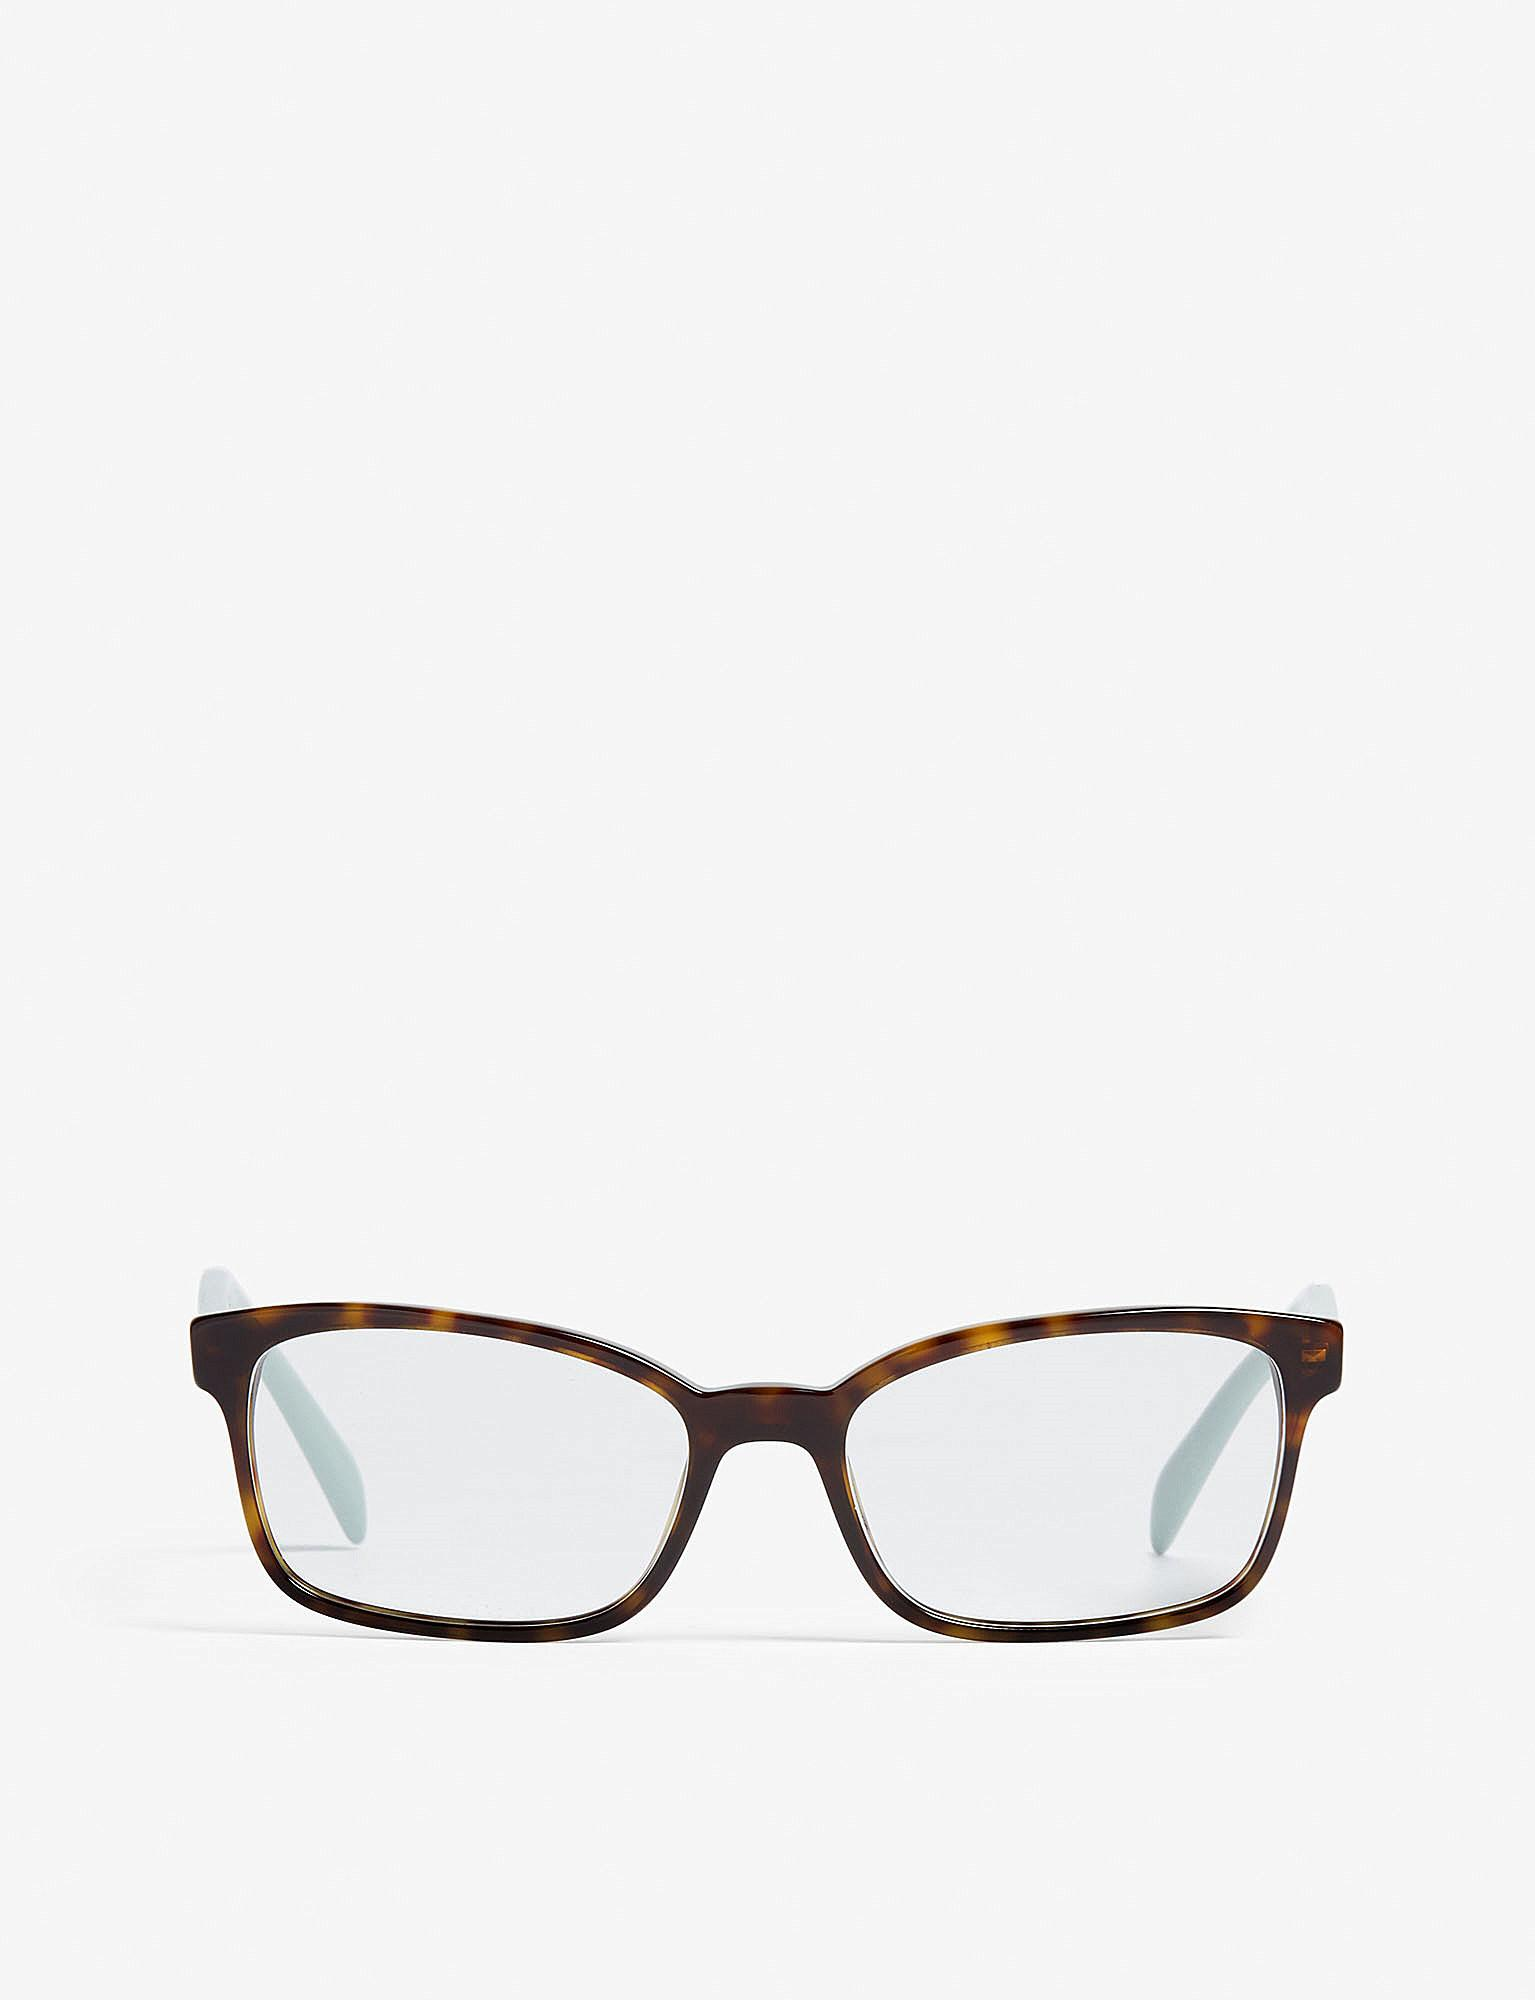 4784759562 Prada Womens Brown Pr18t51 Heritage Rectangle-frame Optical Glasses ...